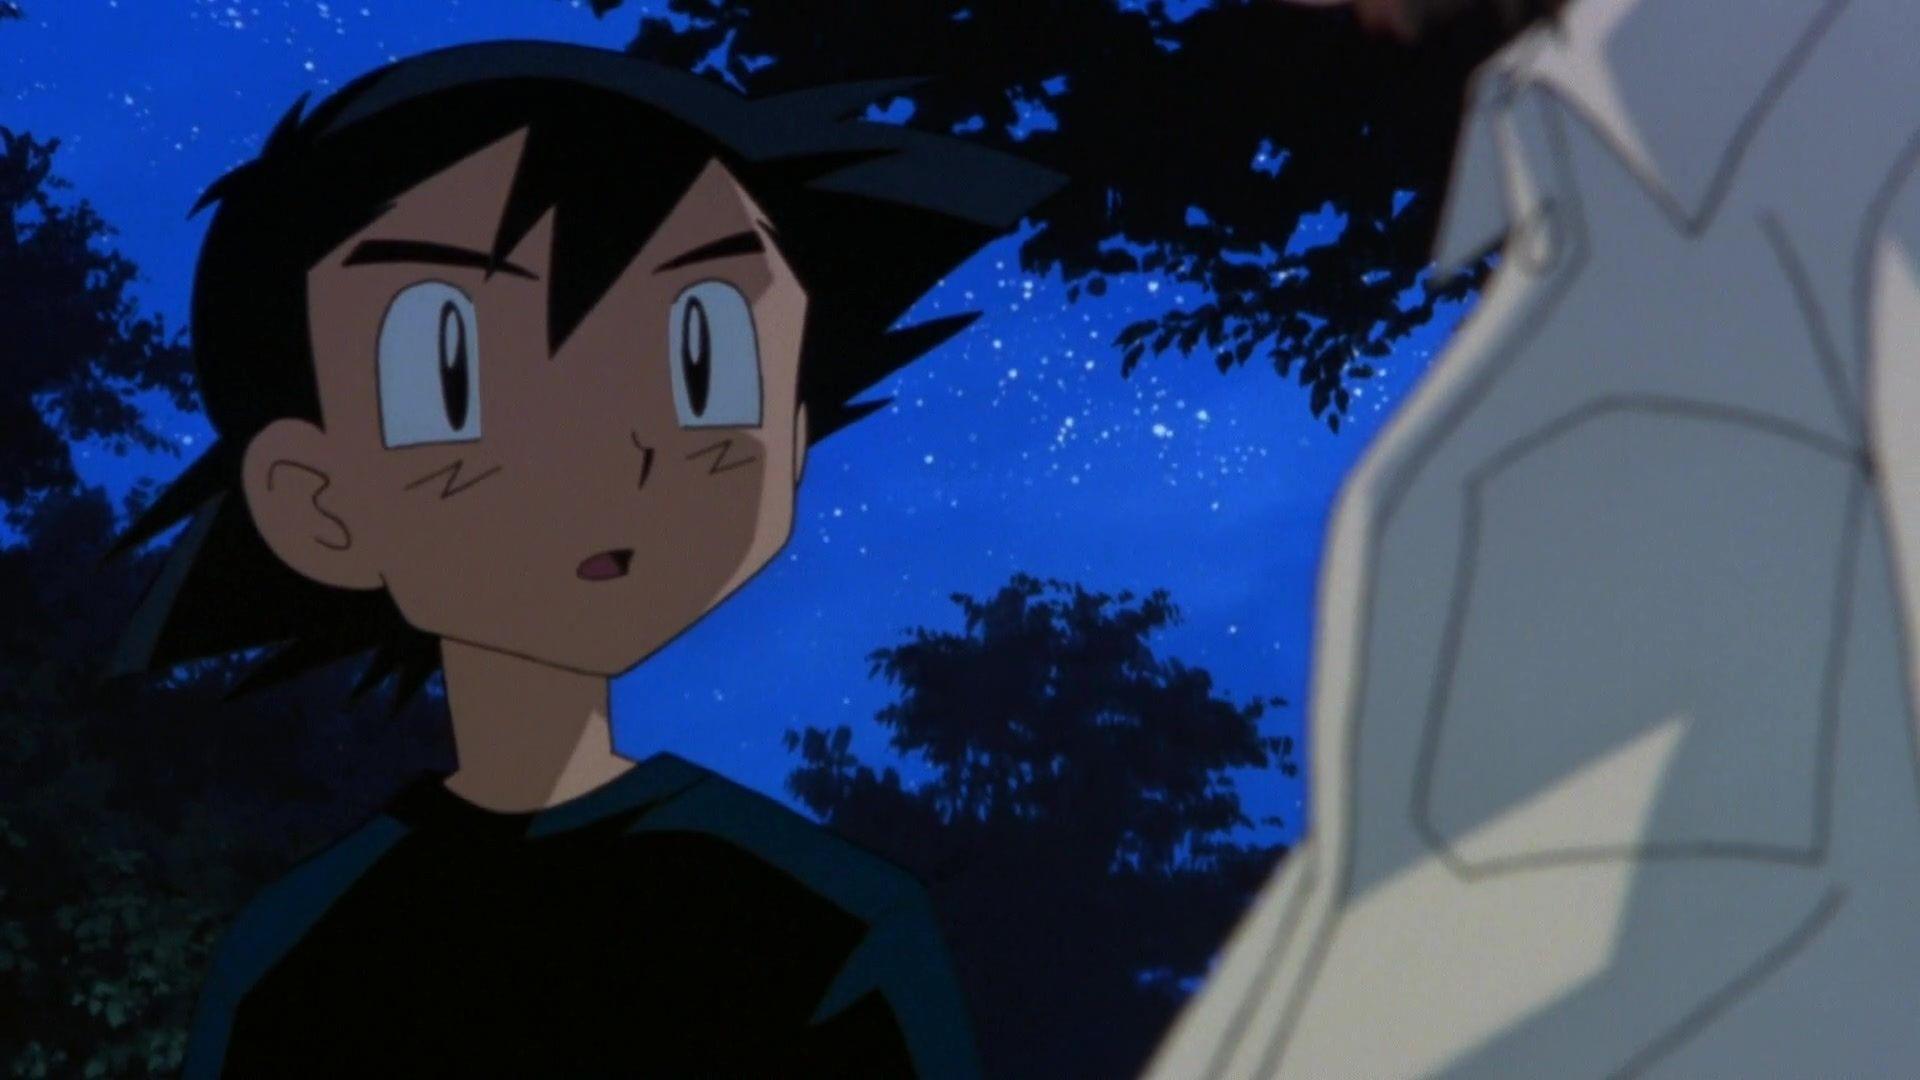 Screencap And Image For Pokemon 4ever Celebi Voice Of The Forest Fancaps Net Pokemon Digimon Image